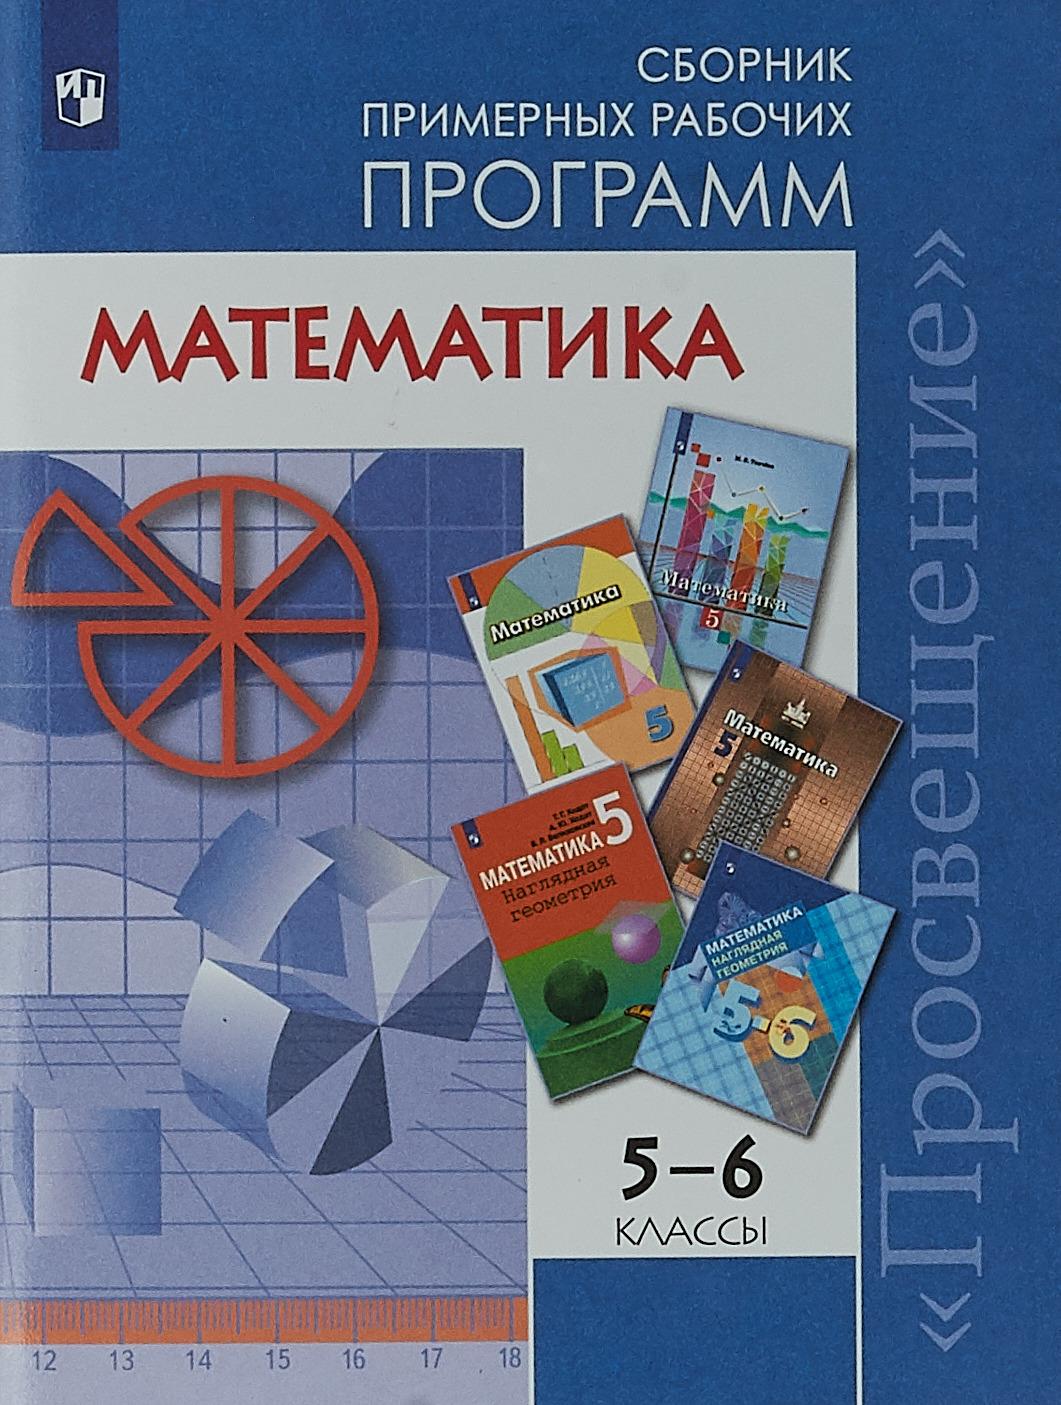 Математика. Сборник рабочих программ. 5-6 классы